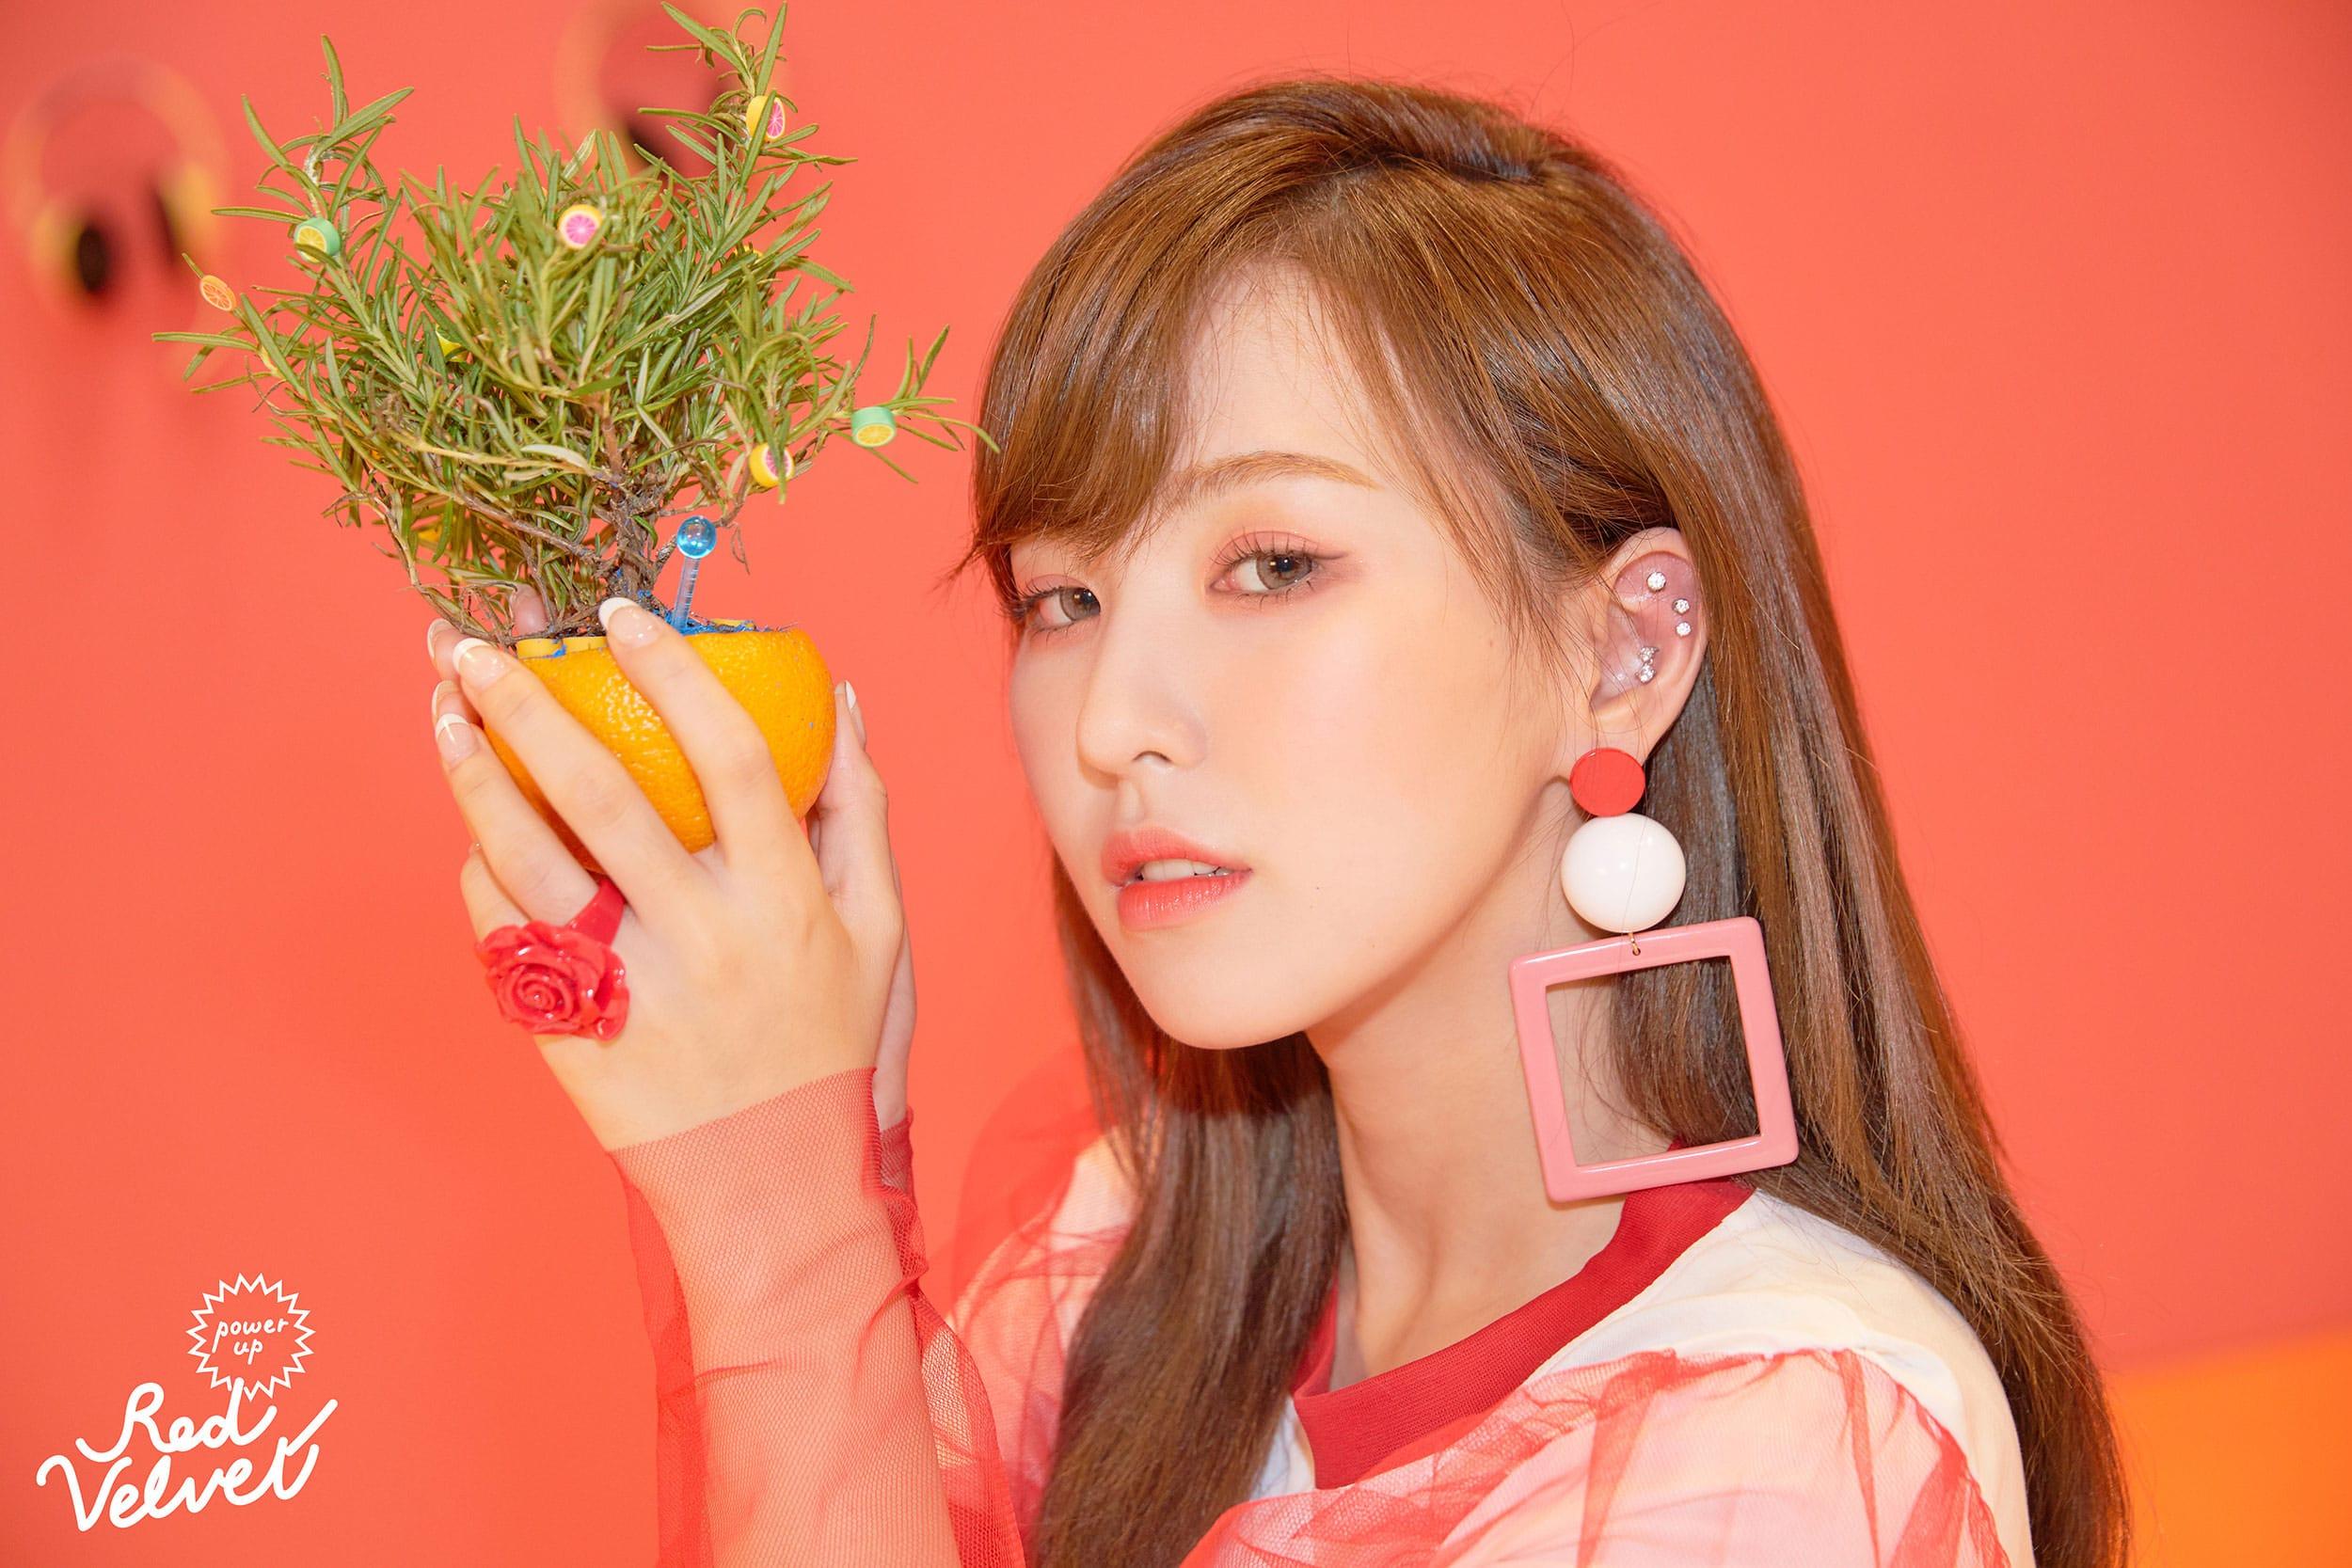 Imagini pentru Wendy (Red Velvet)